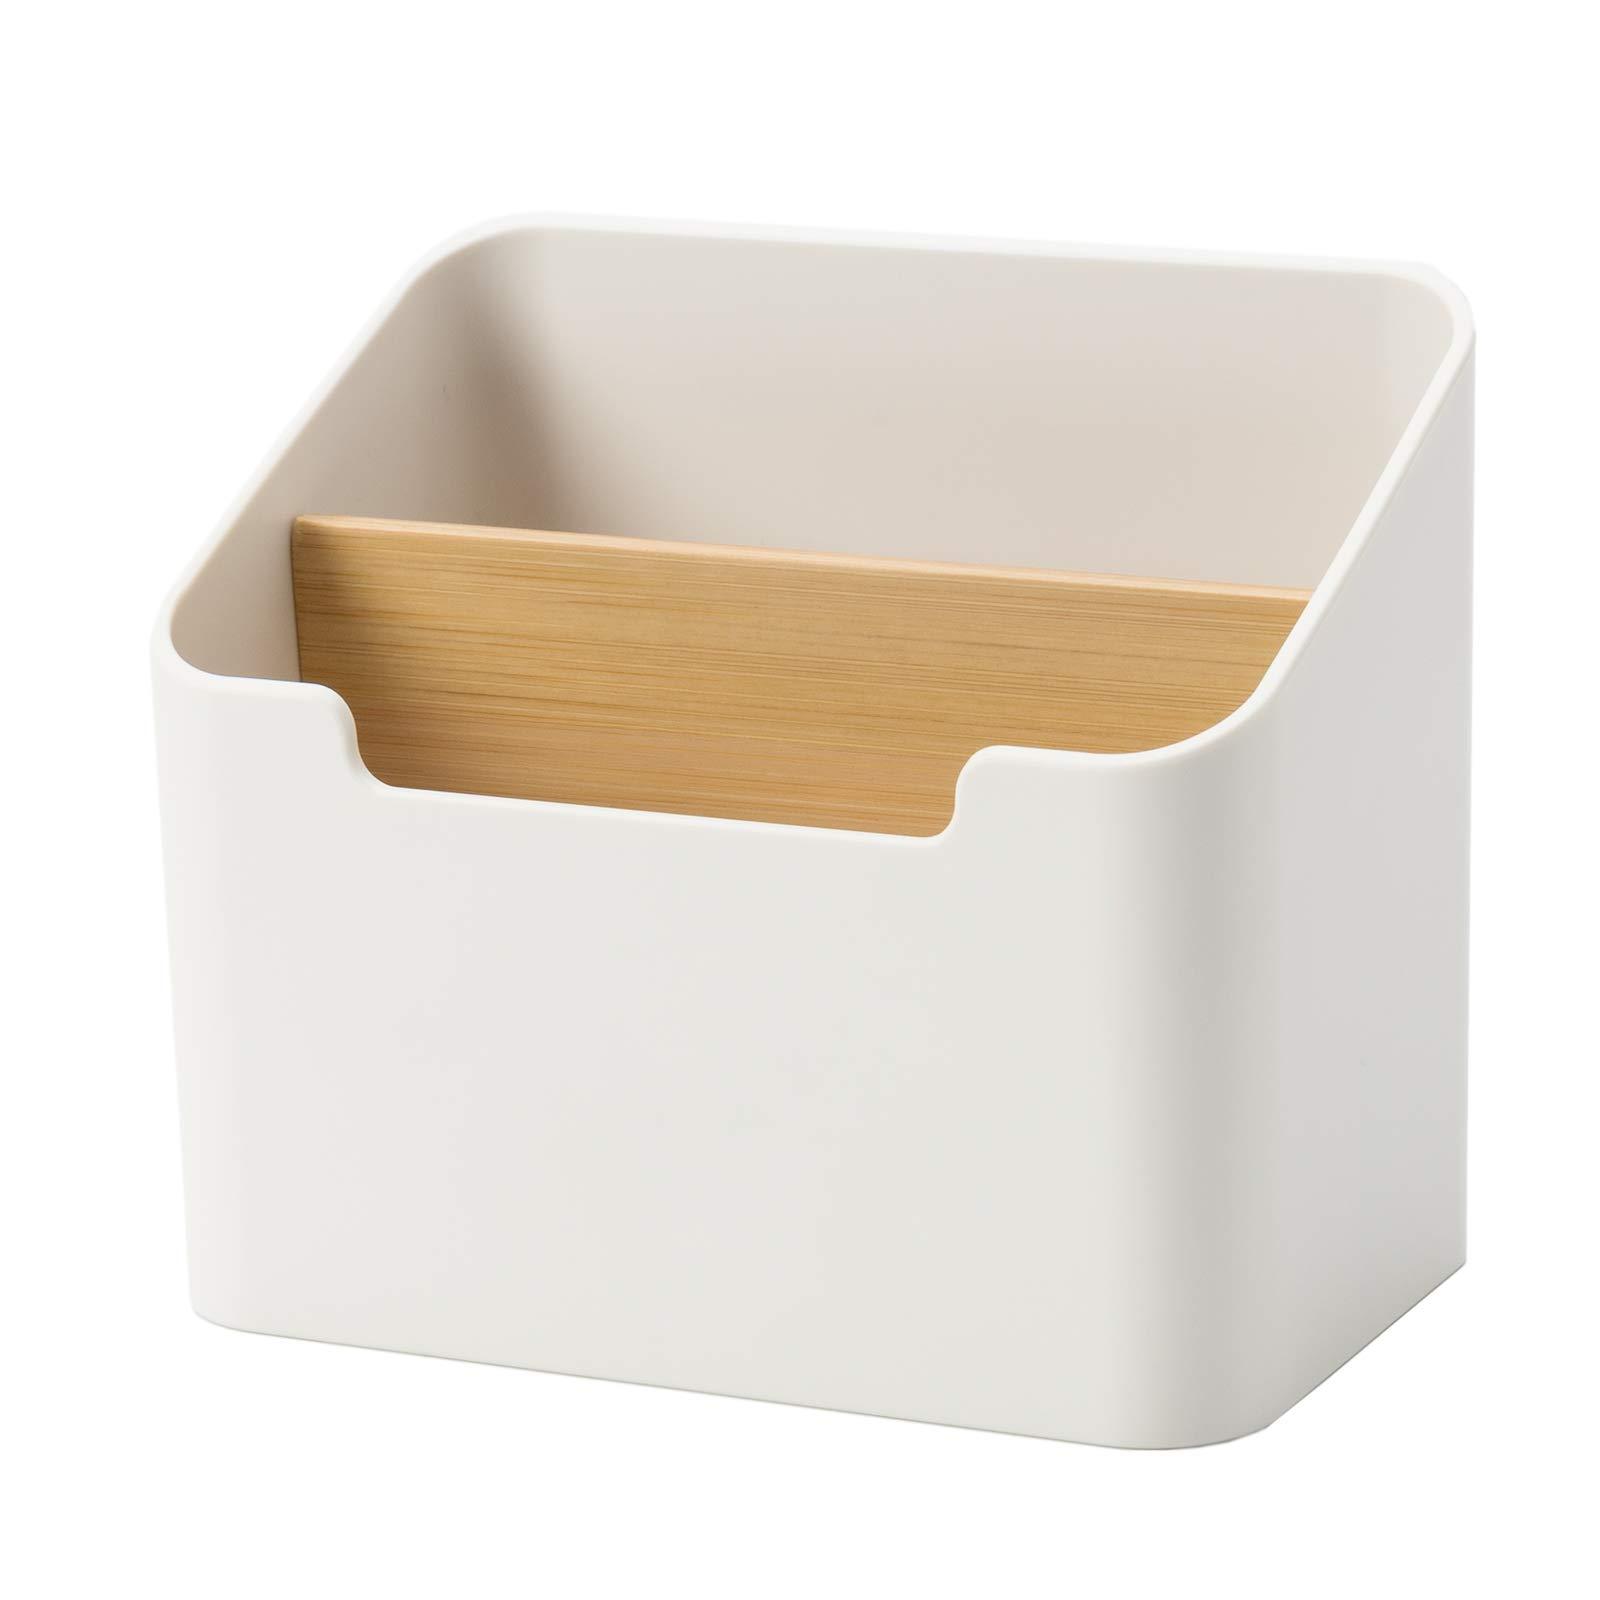 Poeland Remote Control Holder Desk Storage Organizer Box Container for Desk, Office Supplies, Home